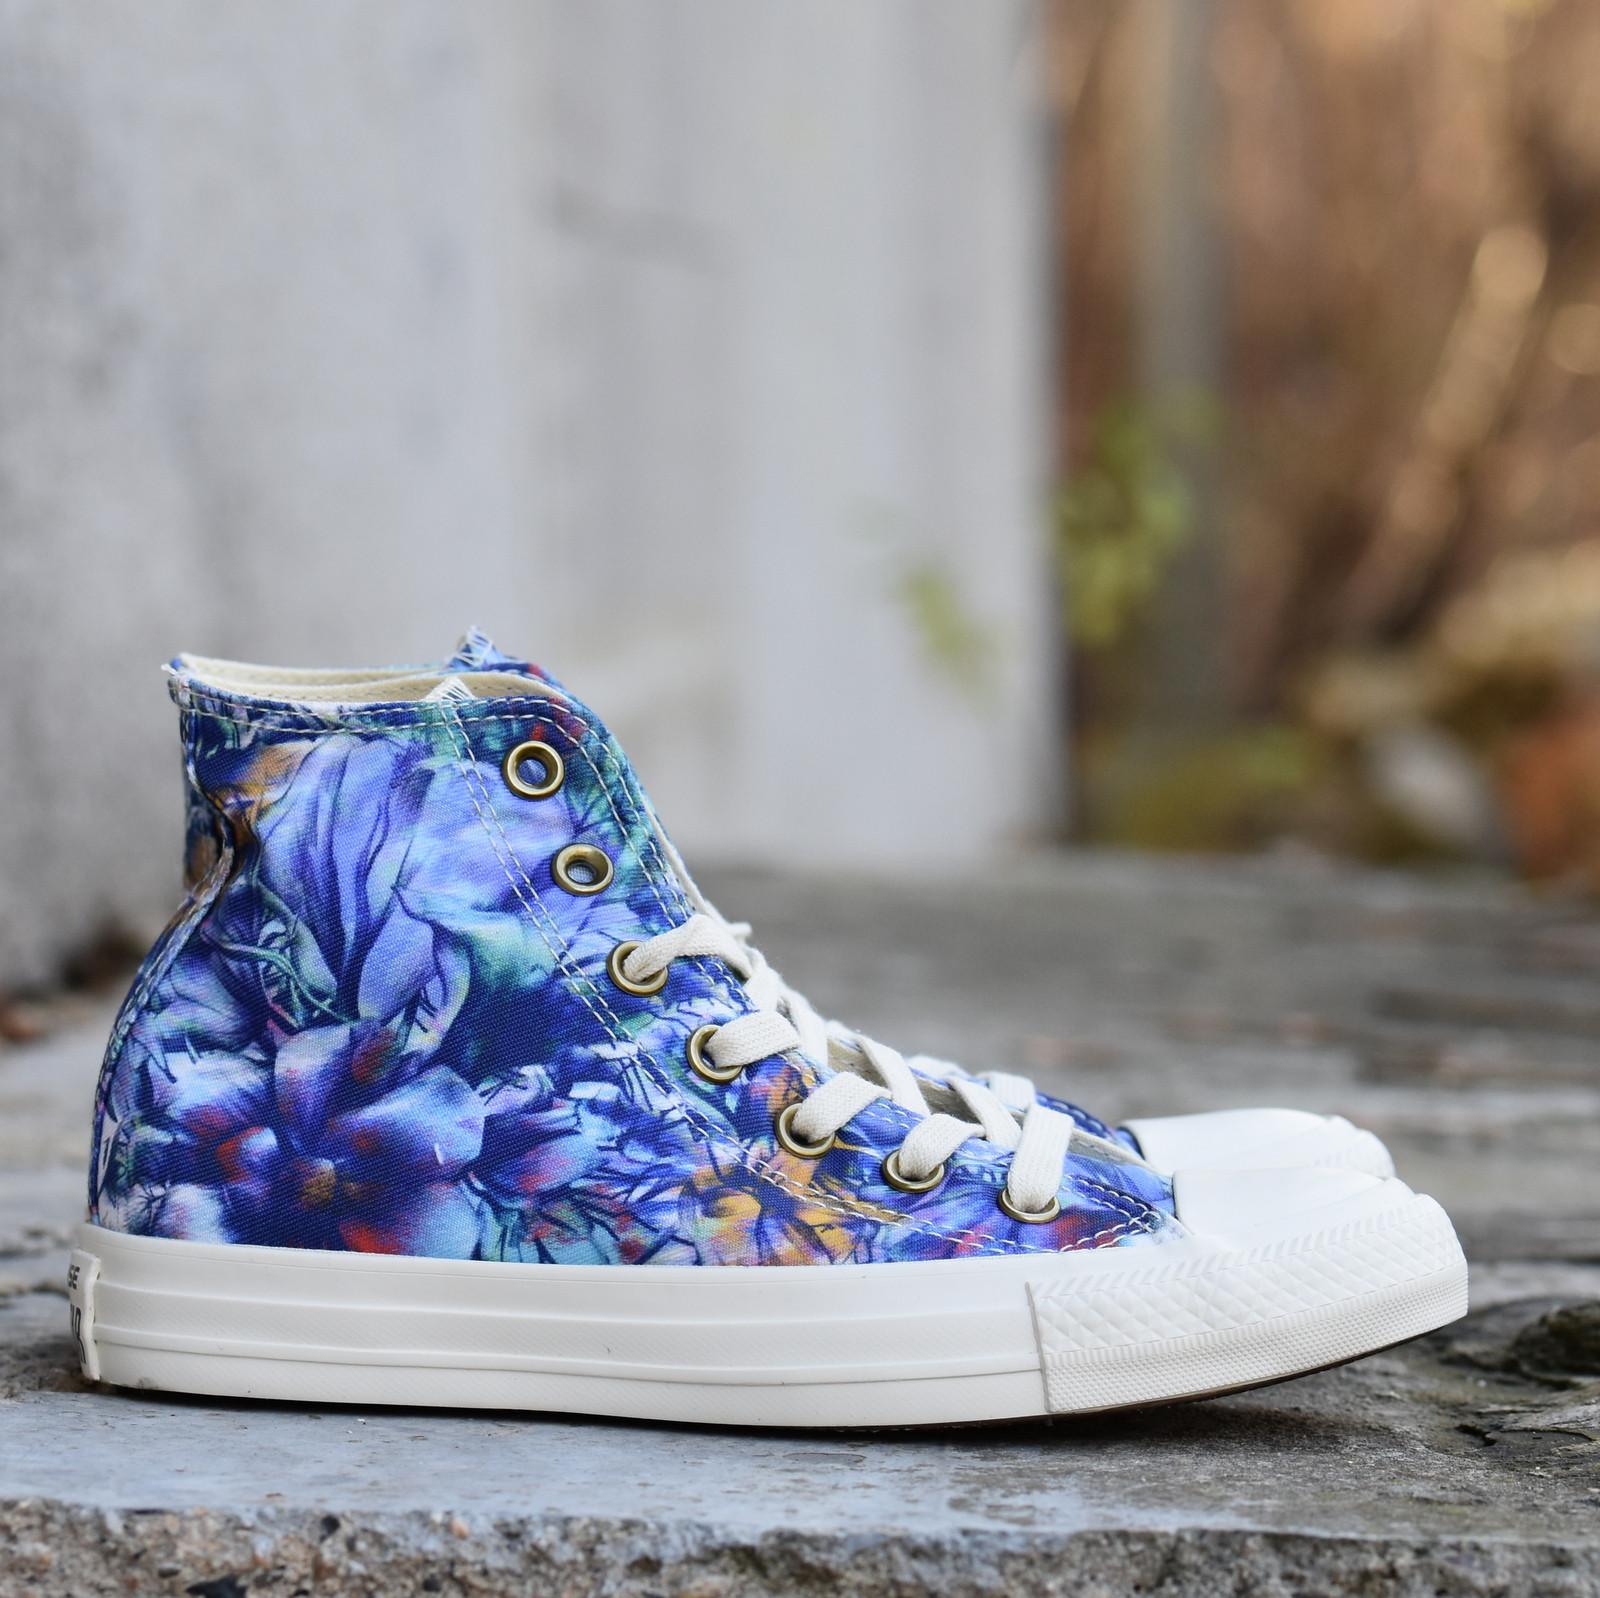 converse CHUCK TAYLOR ALL STAR FLOWER Dámské boty EU 36 C547303 f2456e0cb0